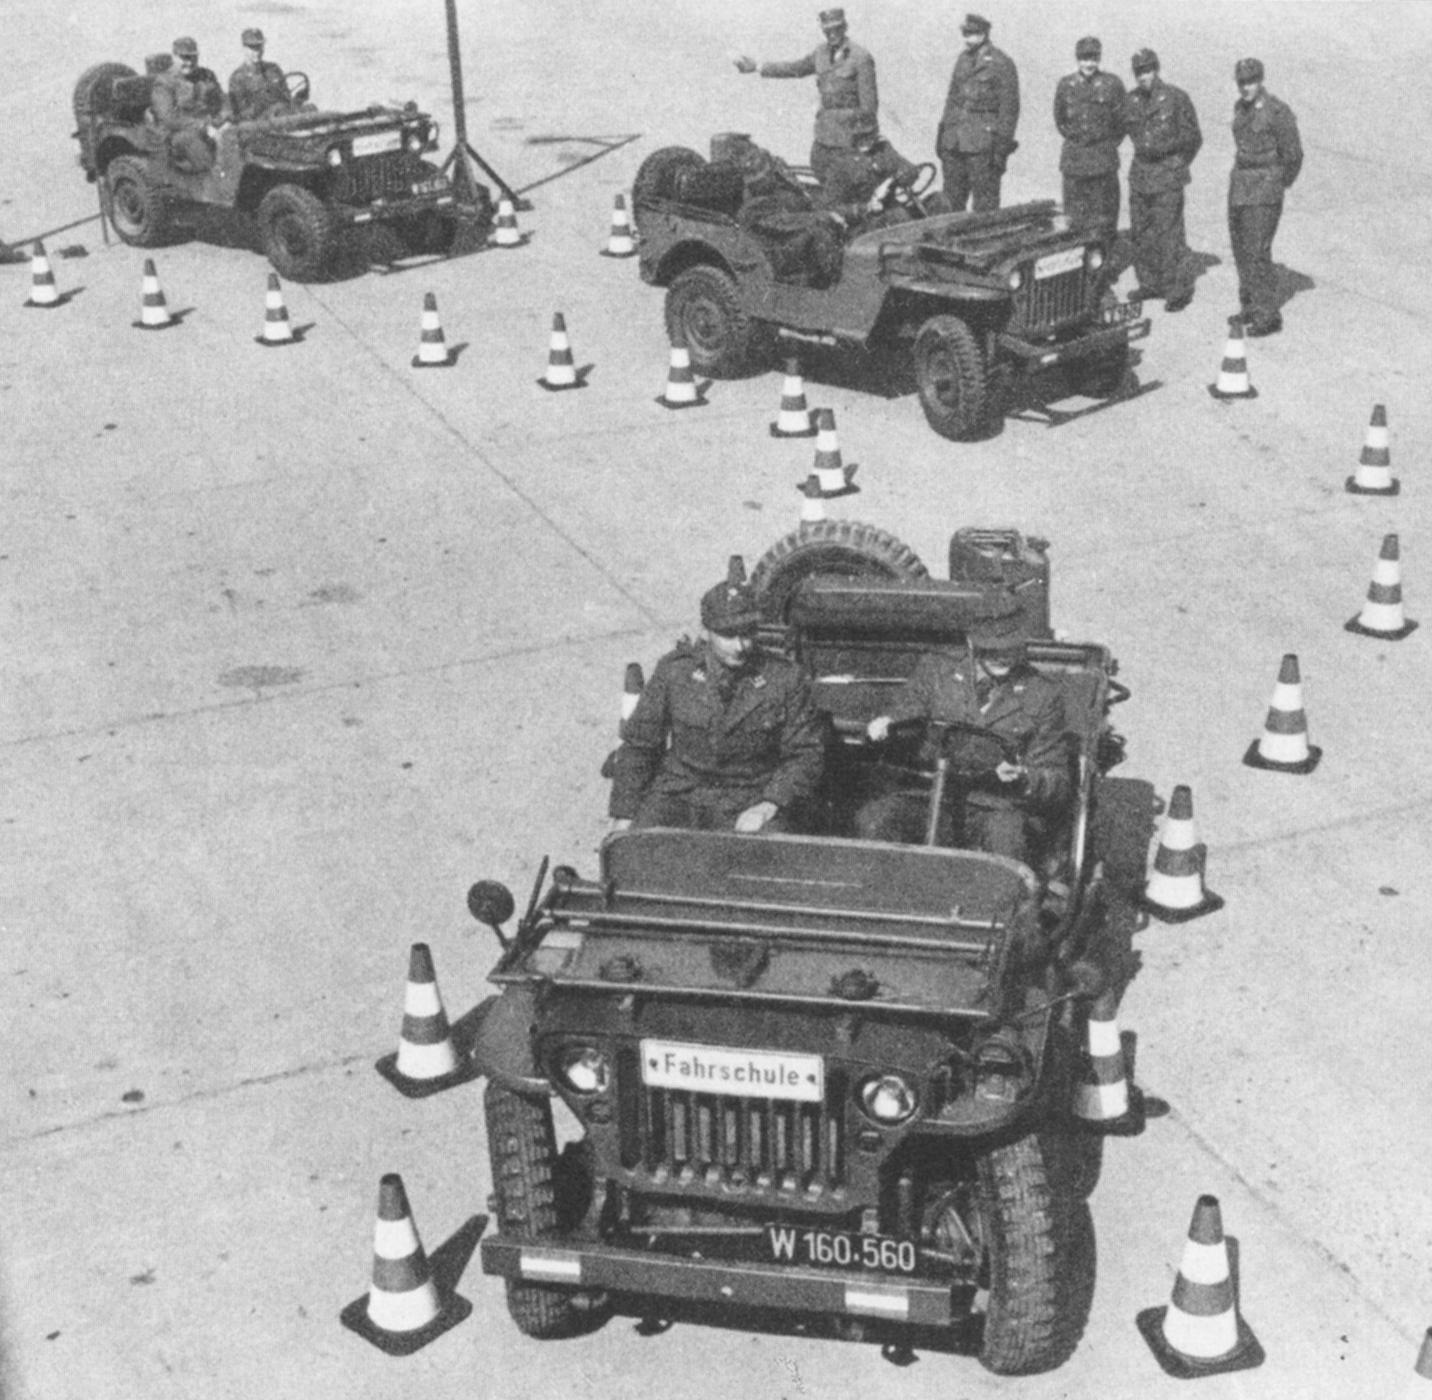 D:\Archiv Nemeth\Fzg-Gerät-Ausrüstung\Fahrzeuge\Mehrspurige Kfz\BH Fahrzeuge\Jeep\Jeep-FS2.JPG